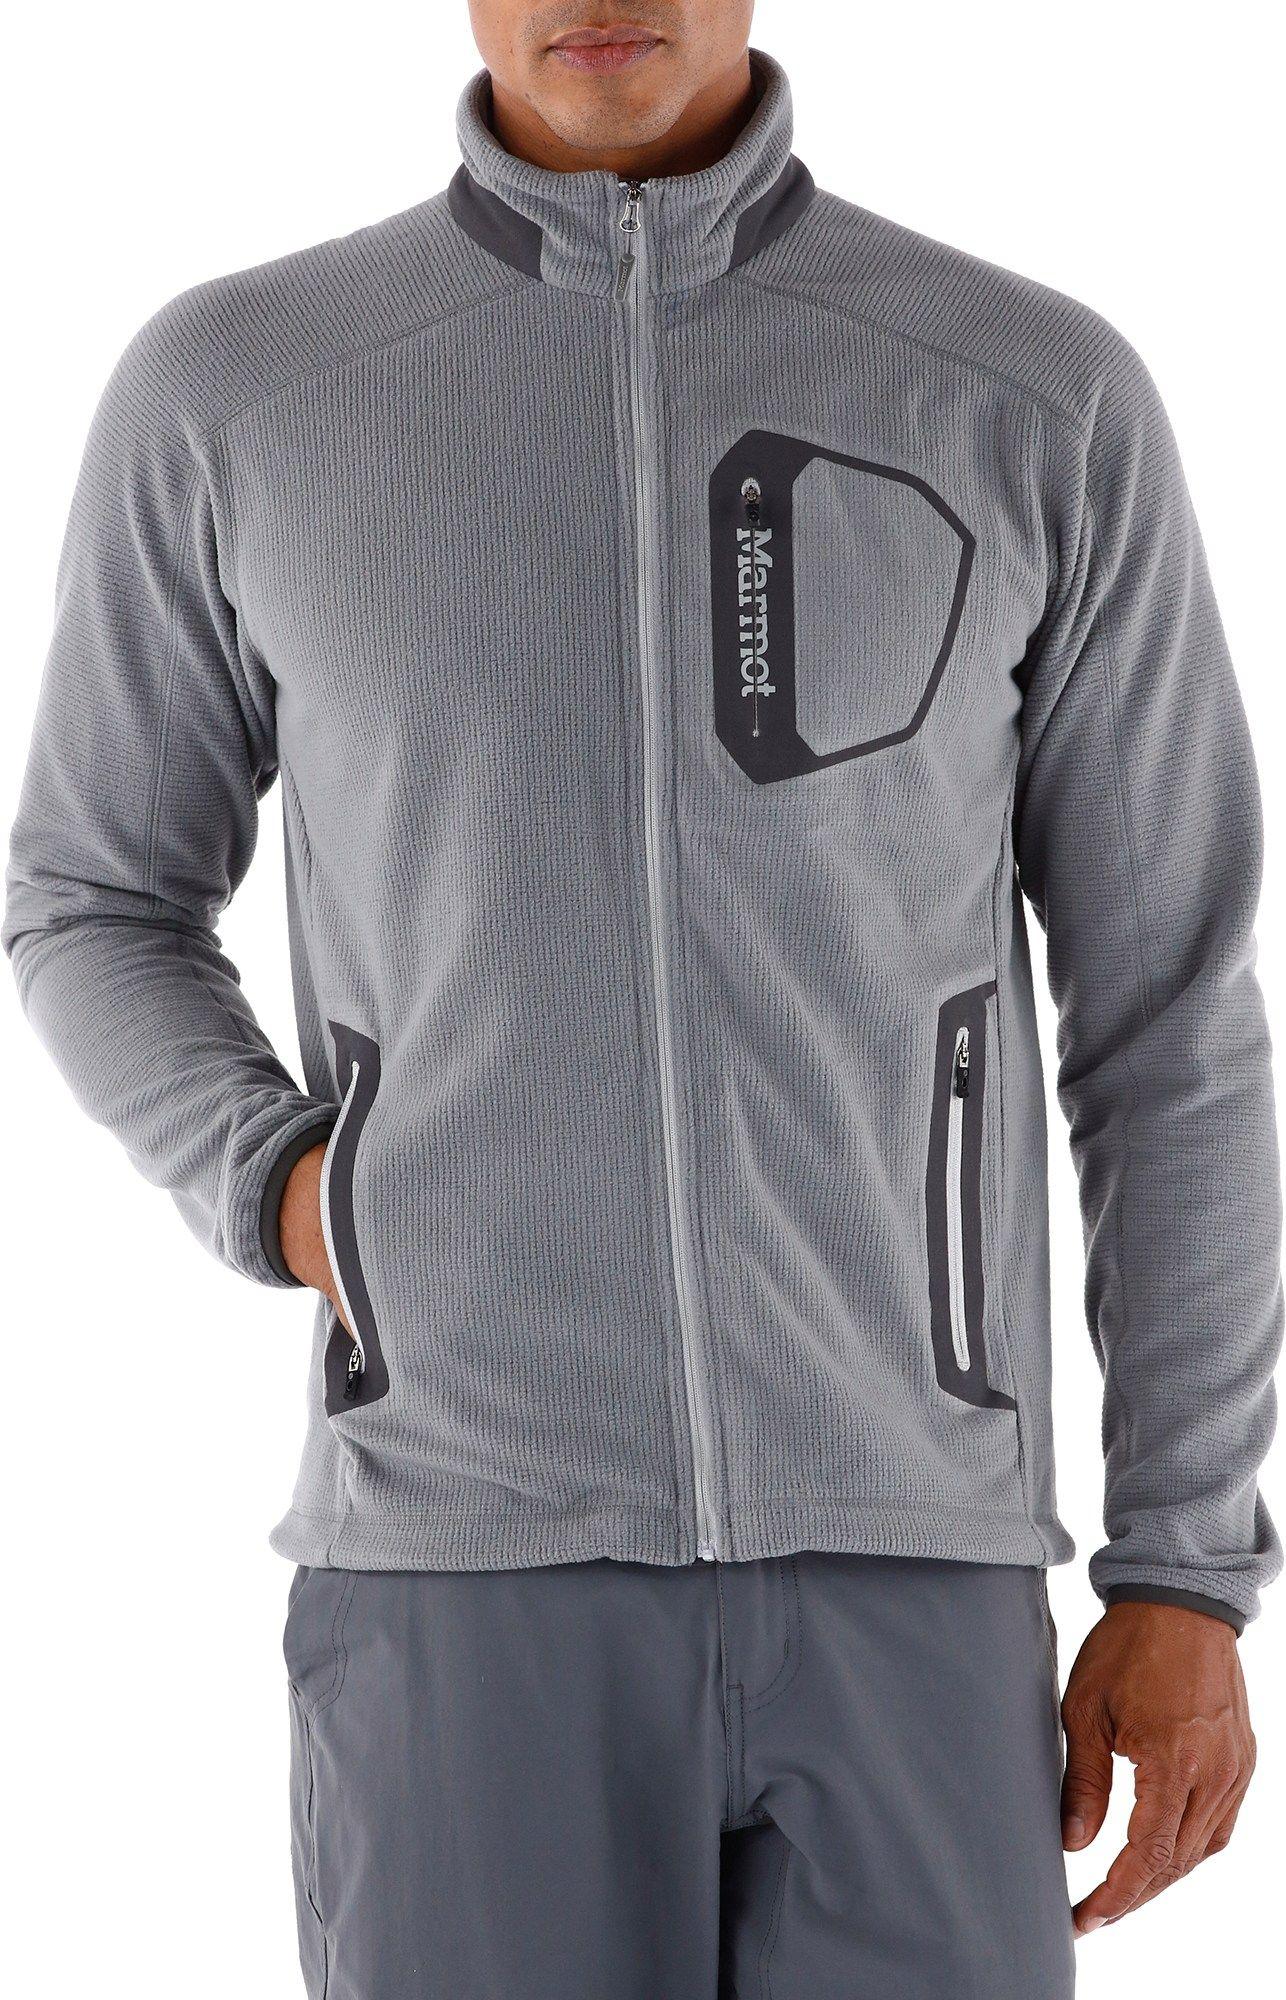 Marmot Alpinist Tech Fleece Jacket Men's Куртка